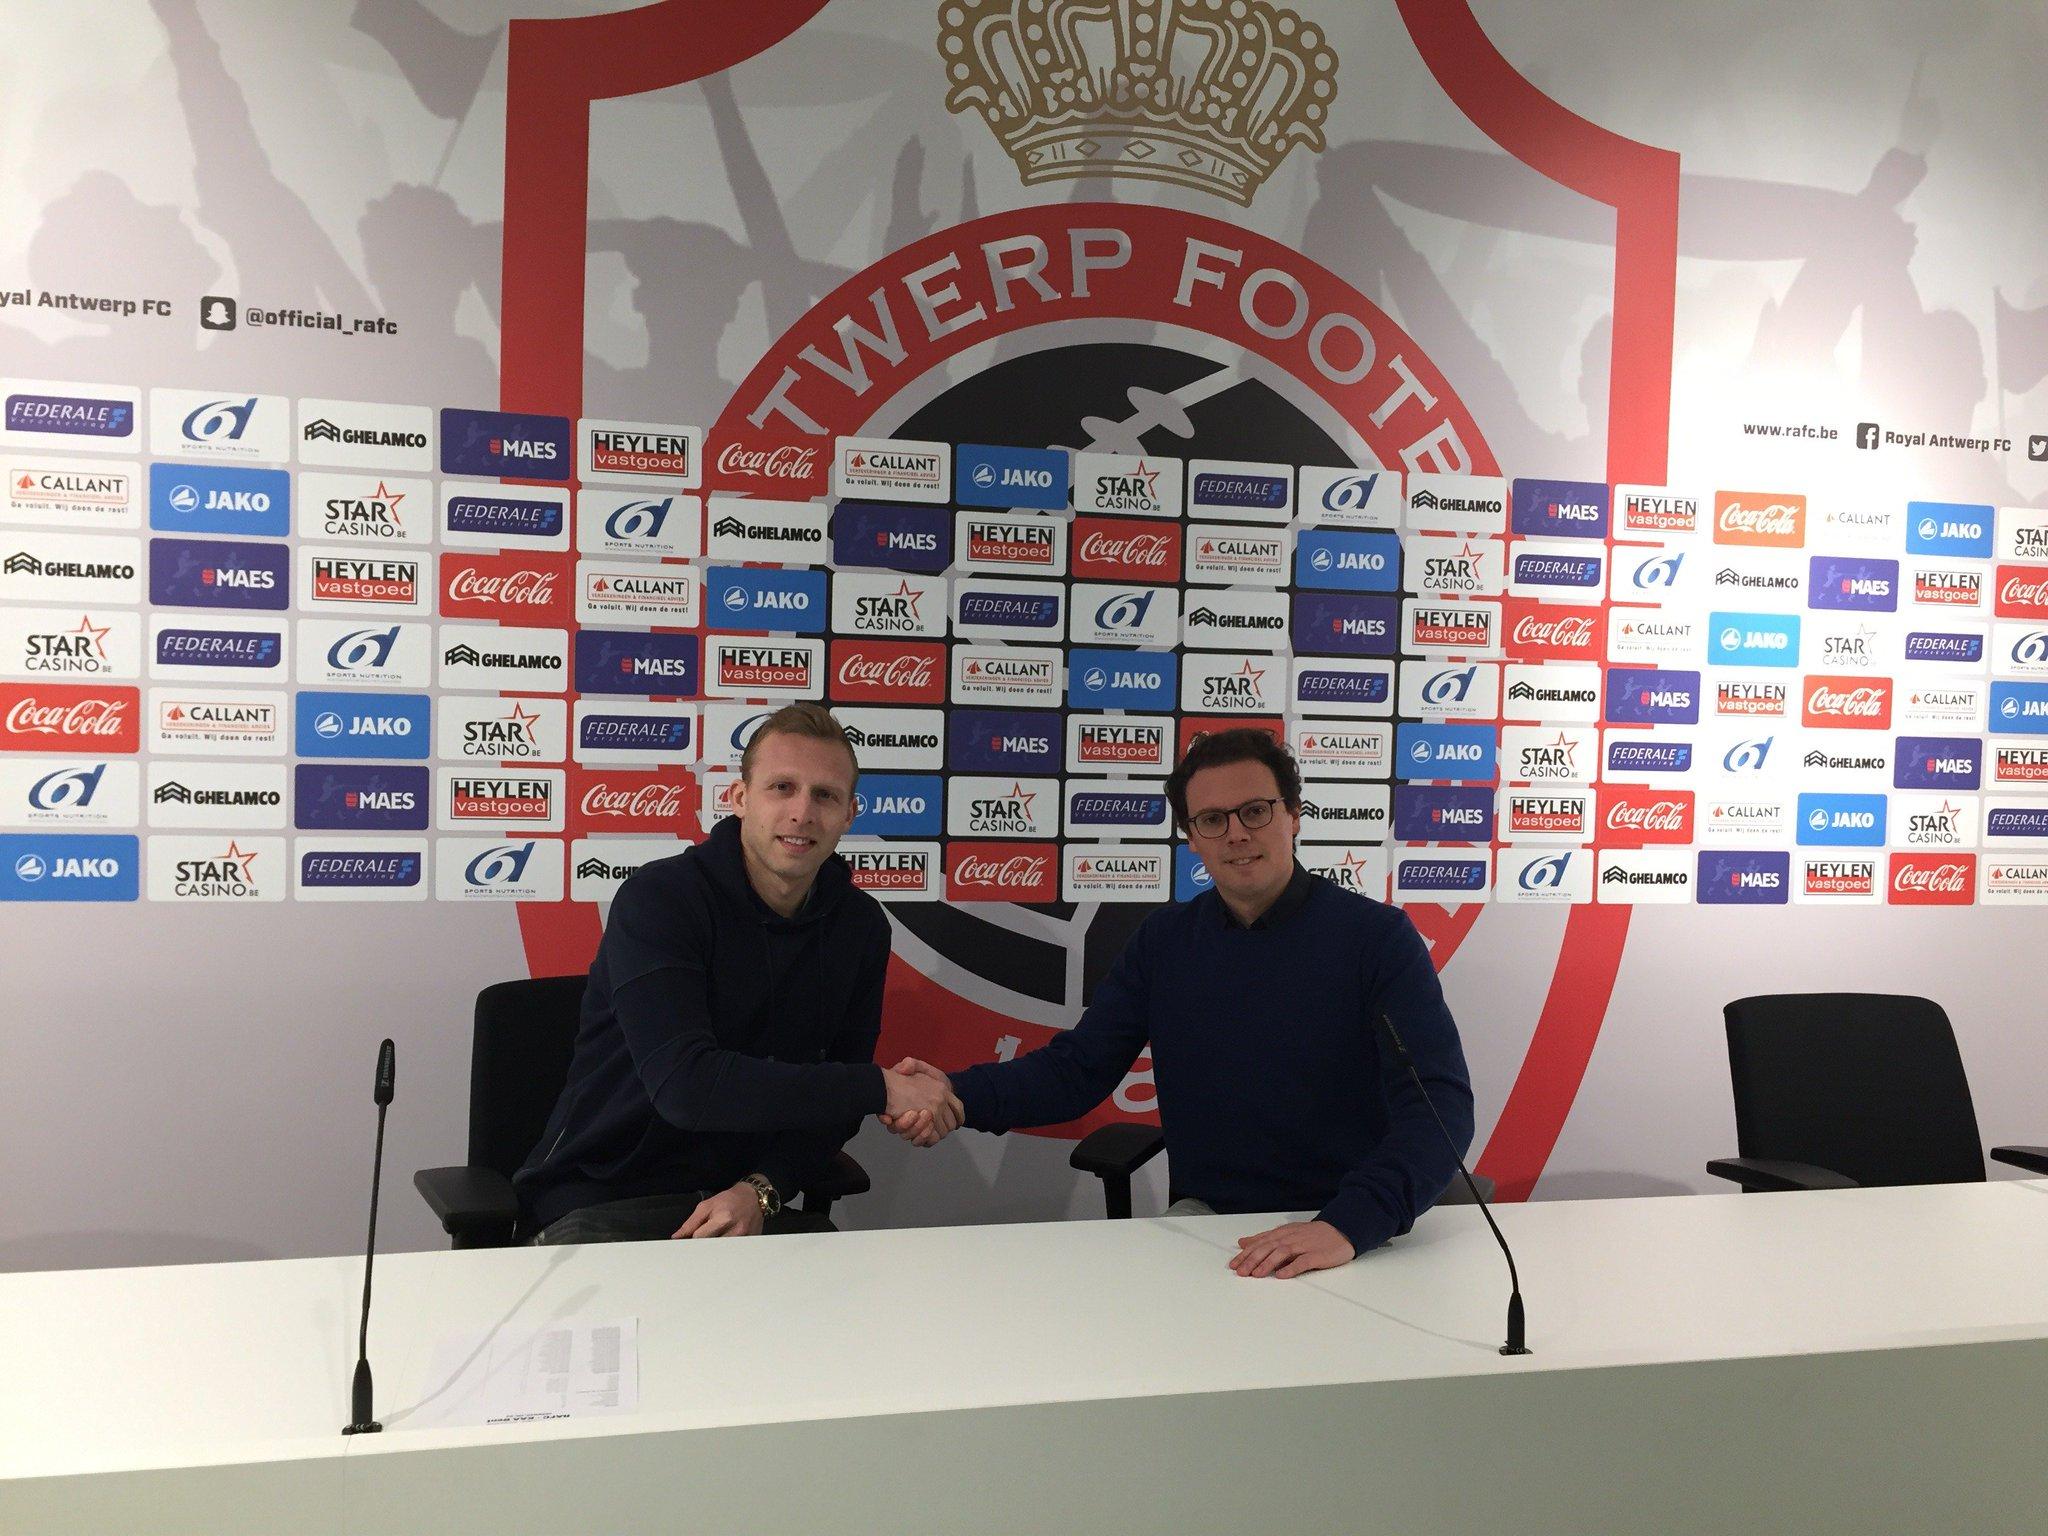 Royal Antwerp FC on Twitter